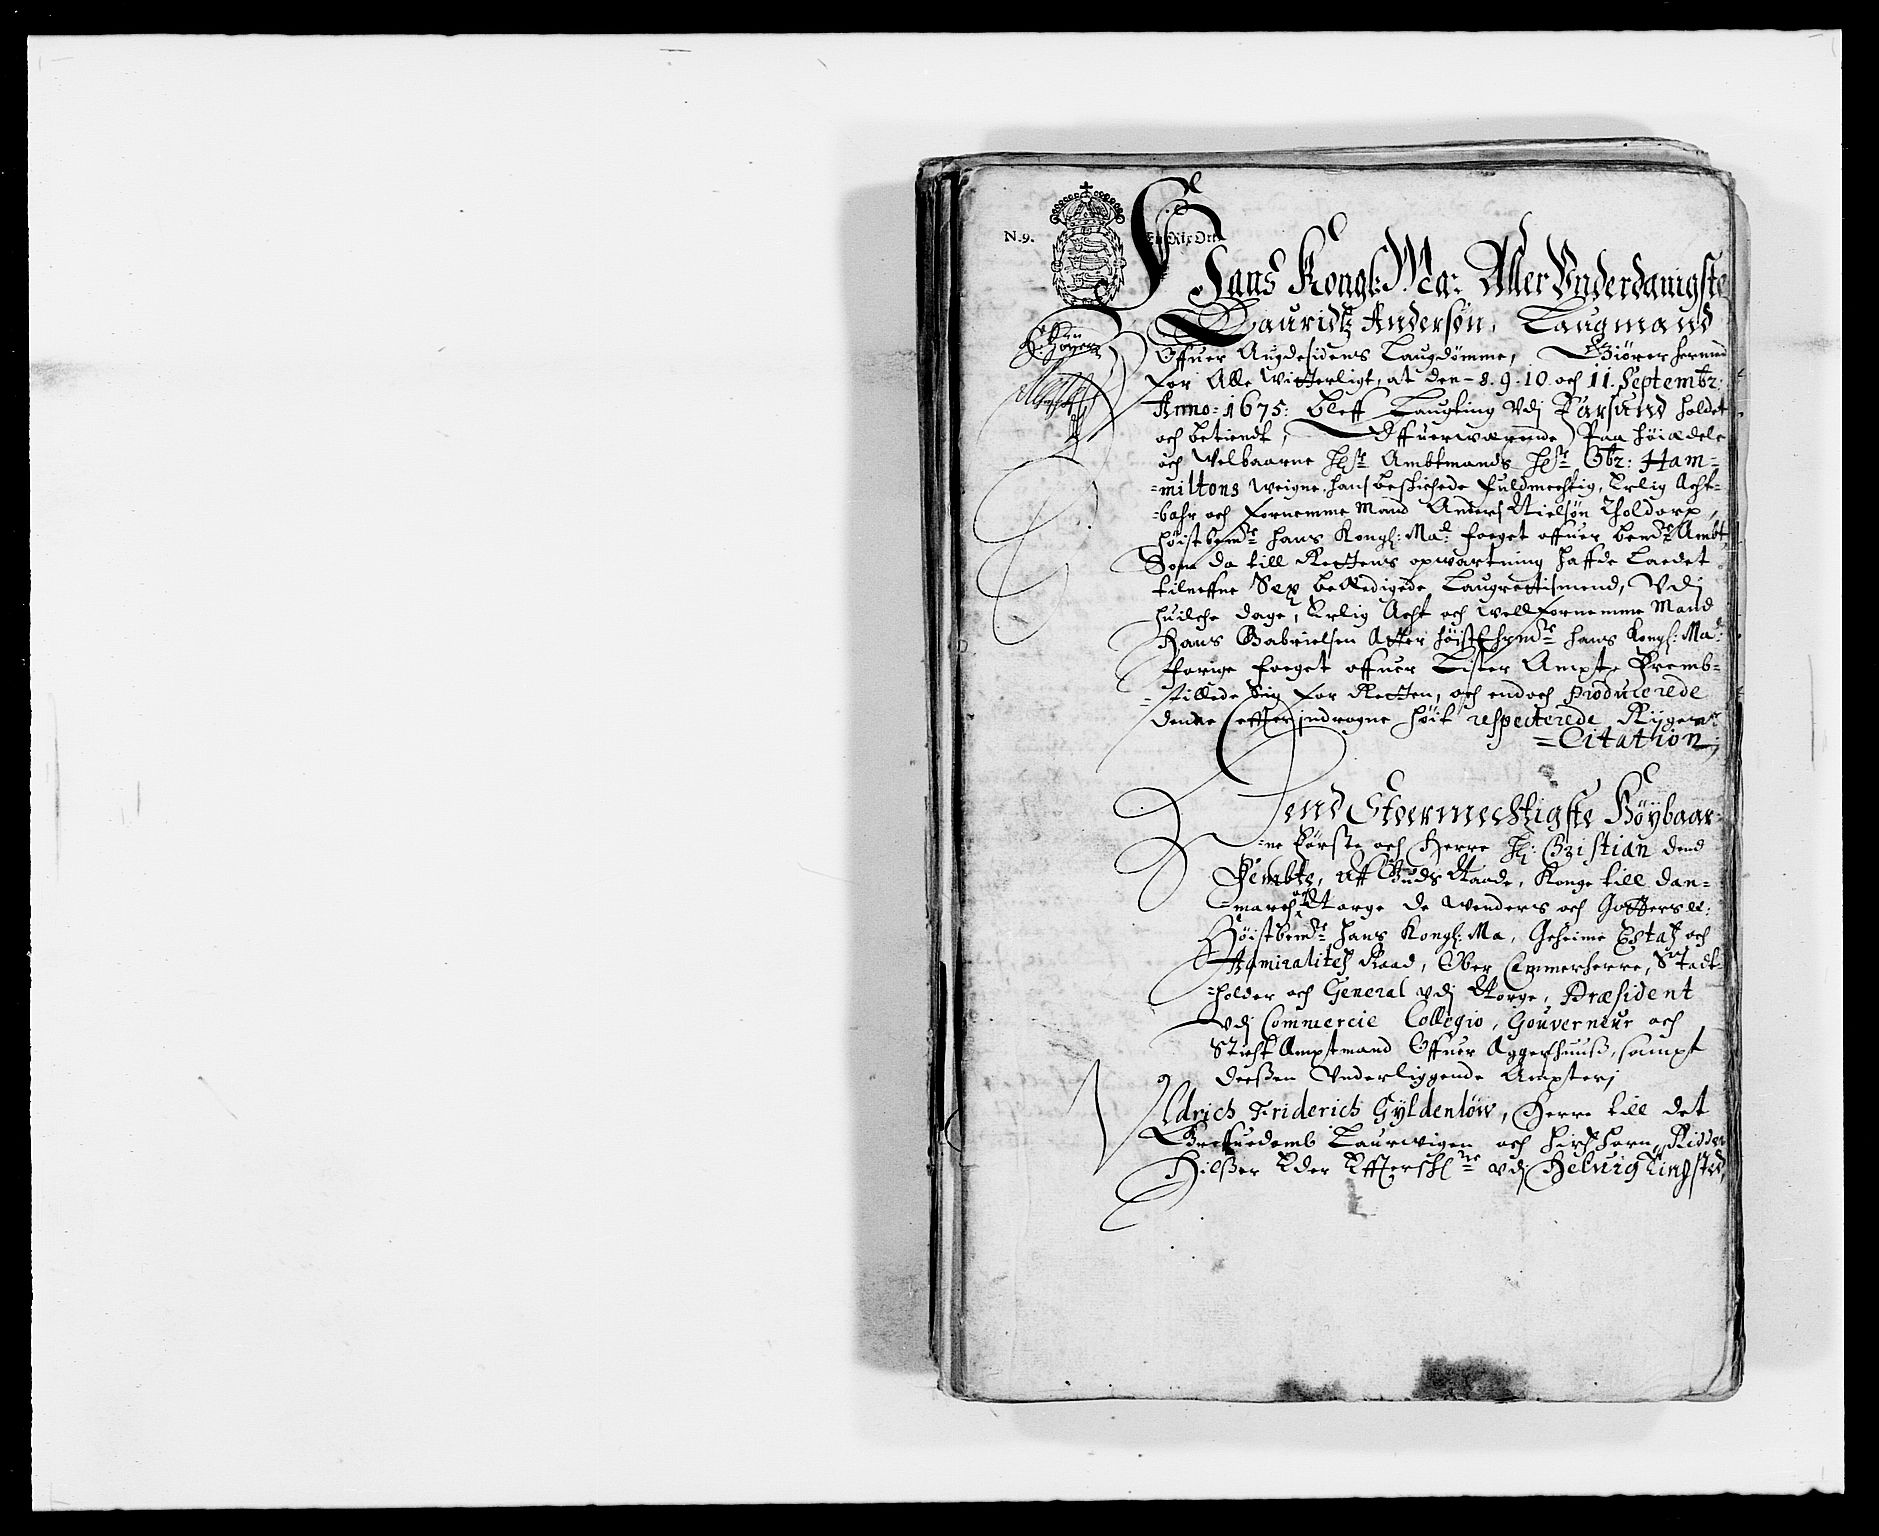 RA, Rentekammeret inntil 1814, Reviderte regnskaper, Fogderegnskap, R41/L2527: Fogderegnskap Lista, 1672, s. 3